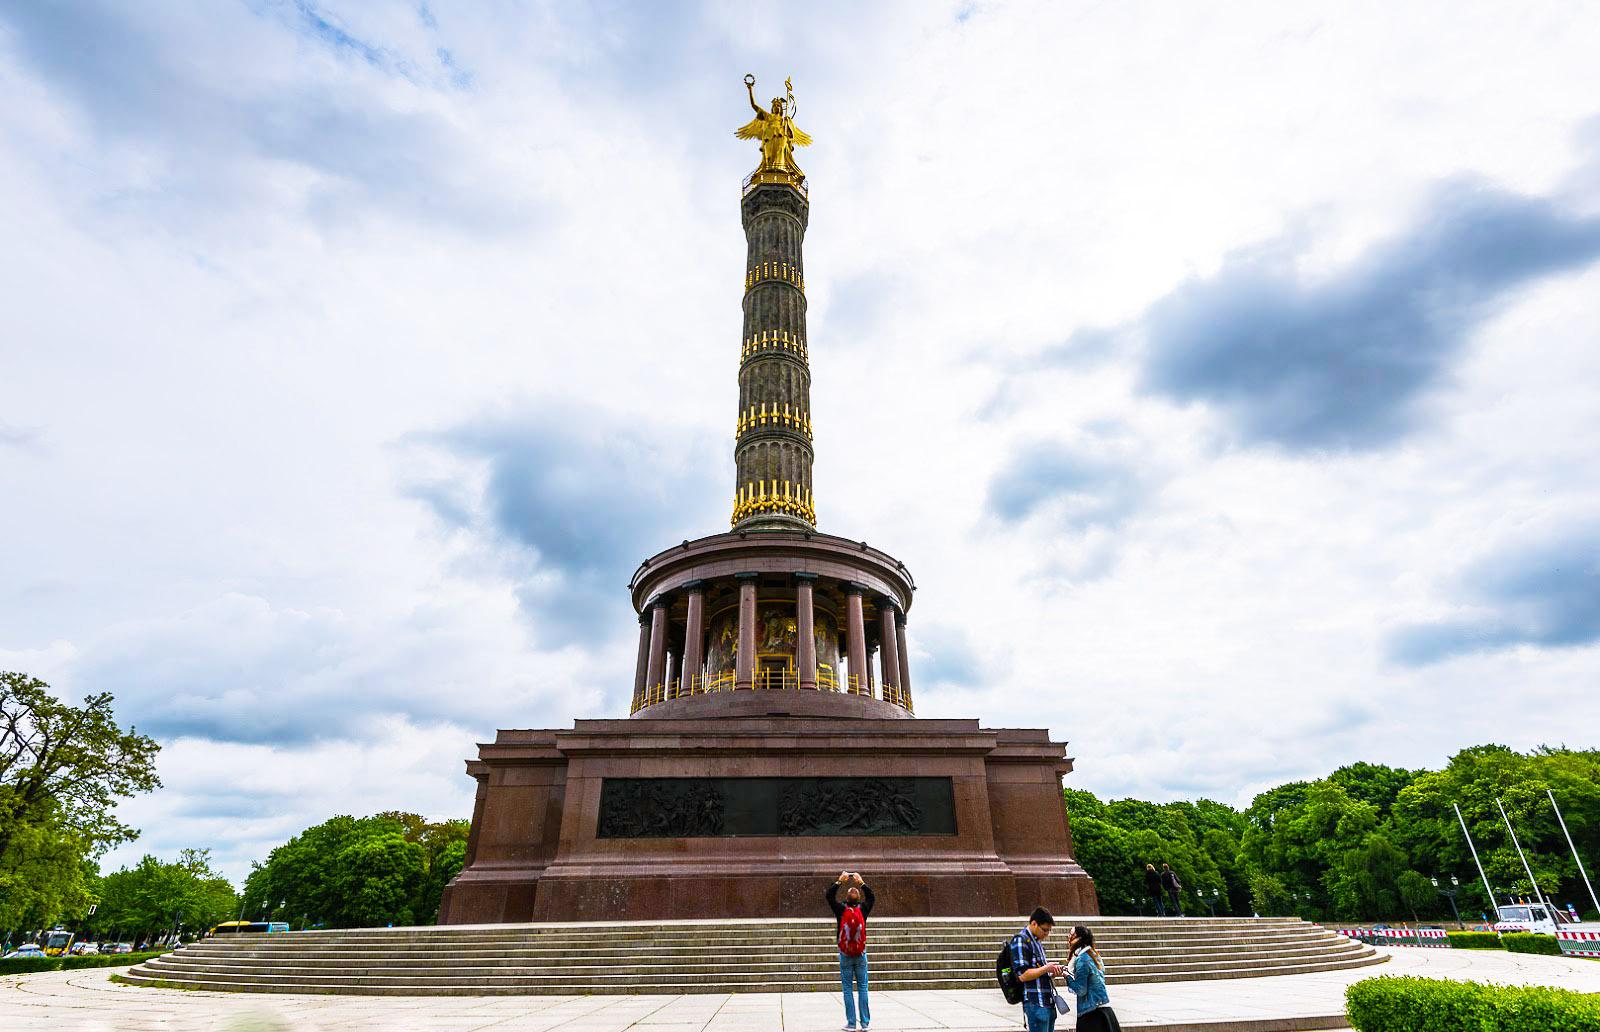 https://fishki.net/1307555-nemeckoe-prikljuchenie-berlin.html